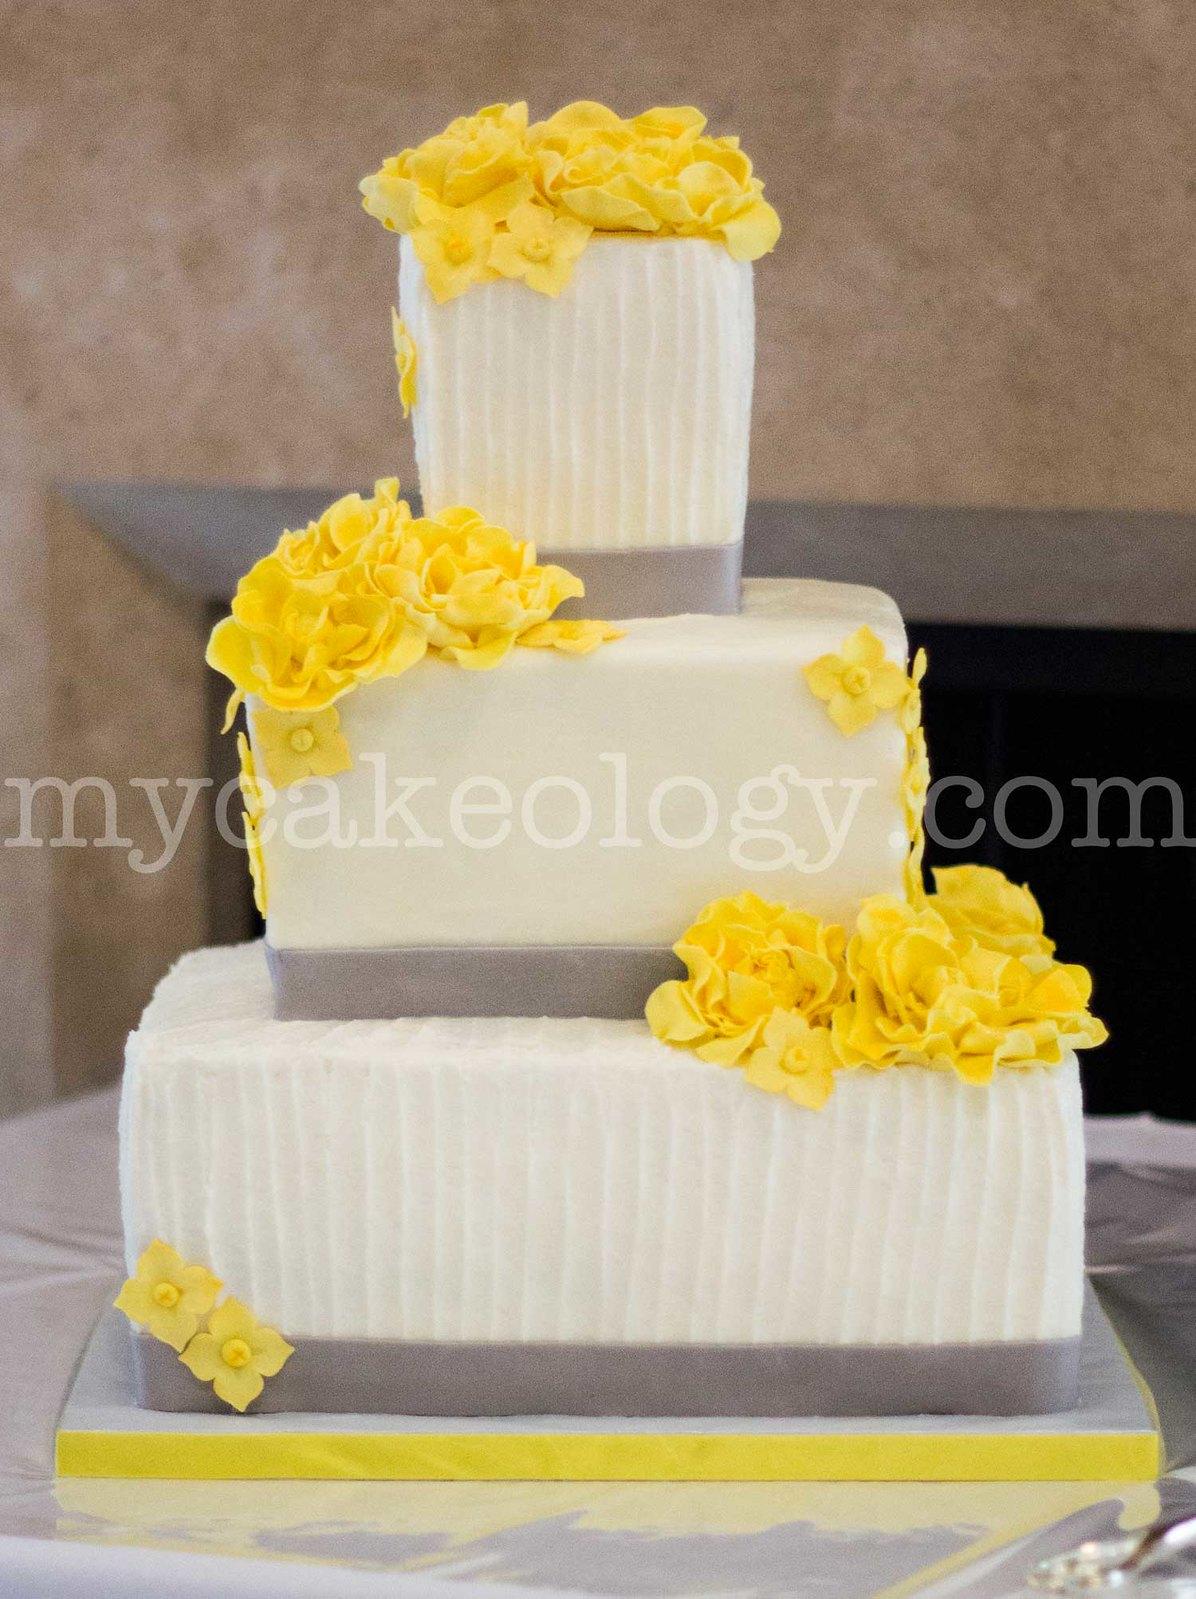 Yellow and Grey Wedding Cake | Flickr - Photo Sharing!